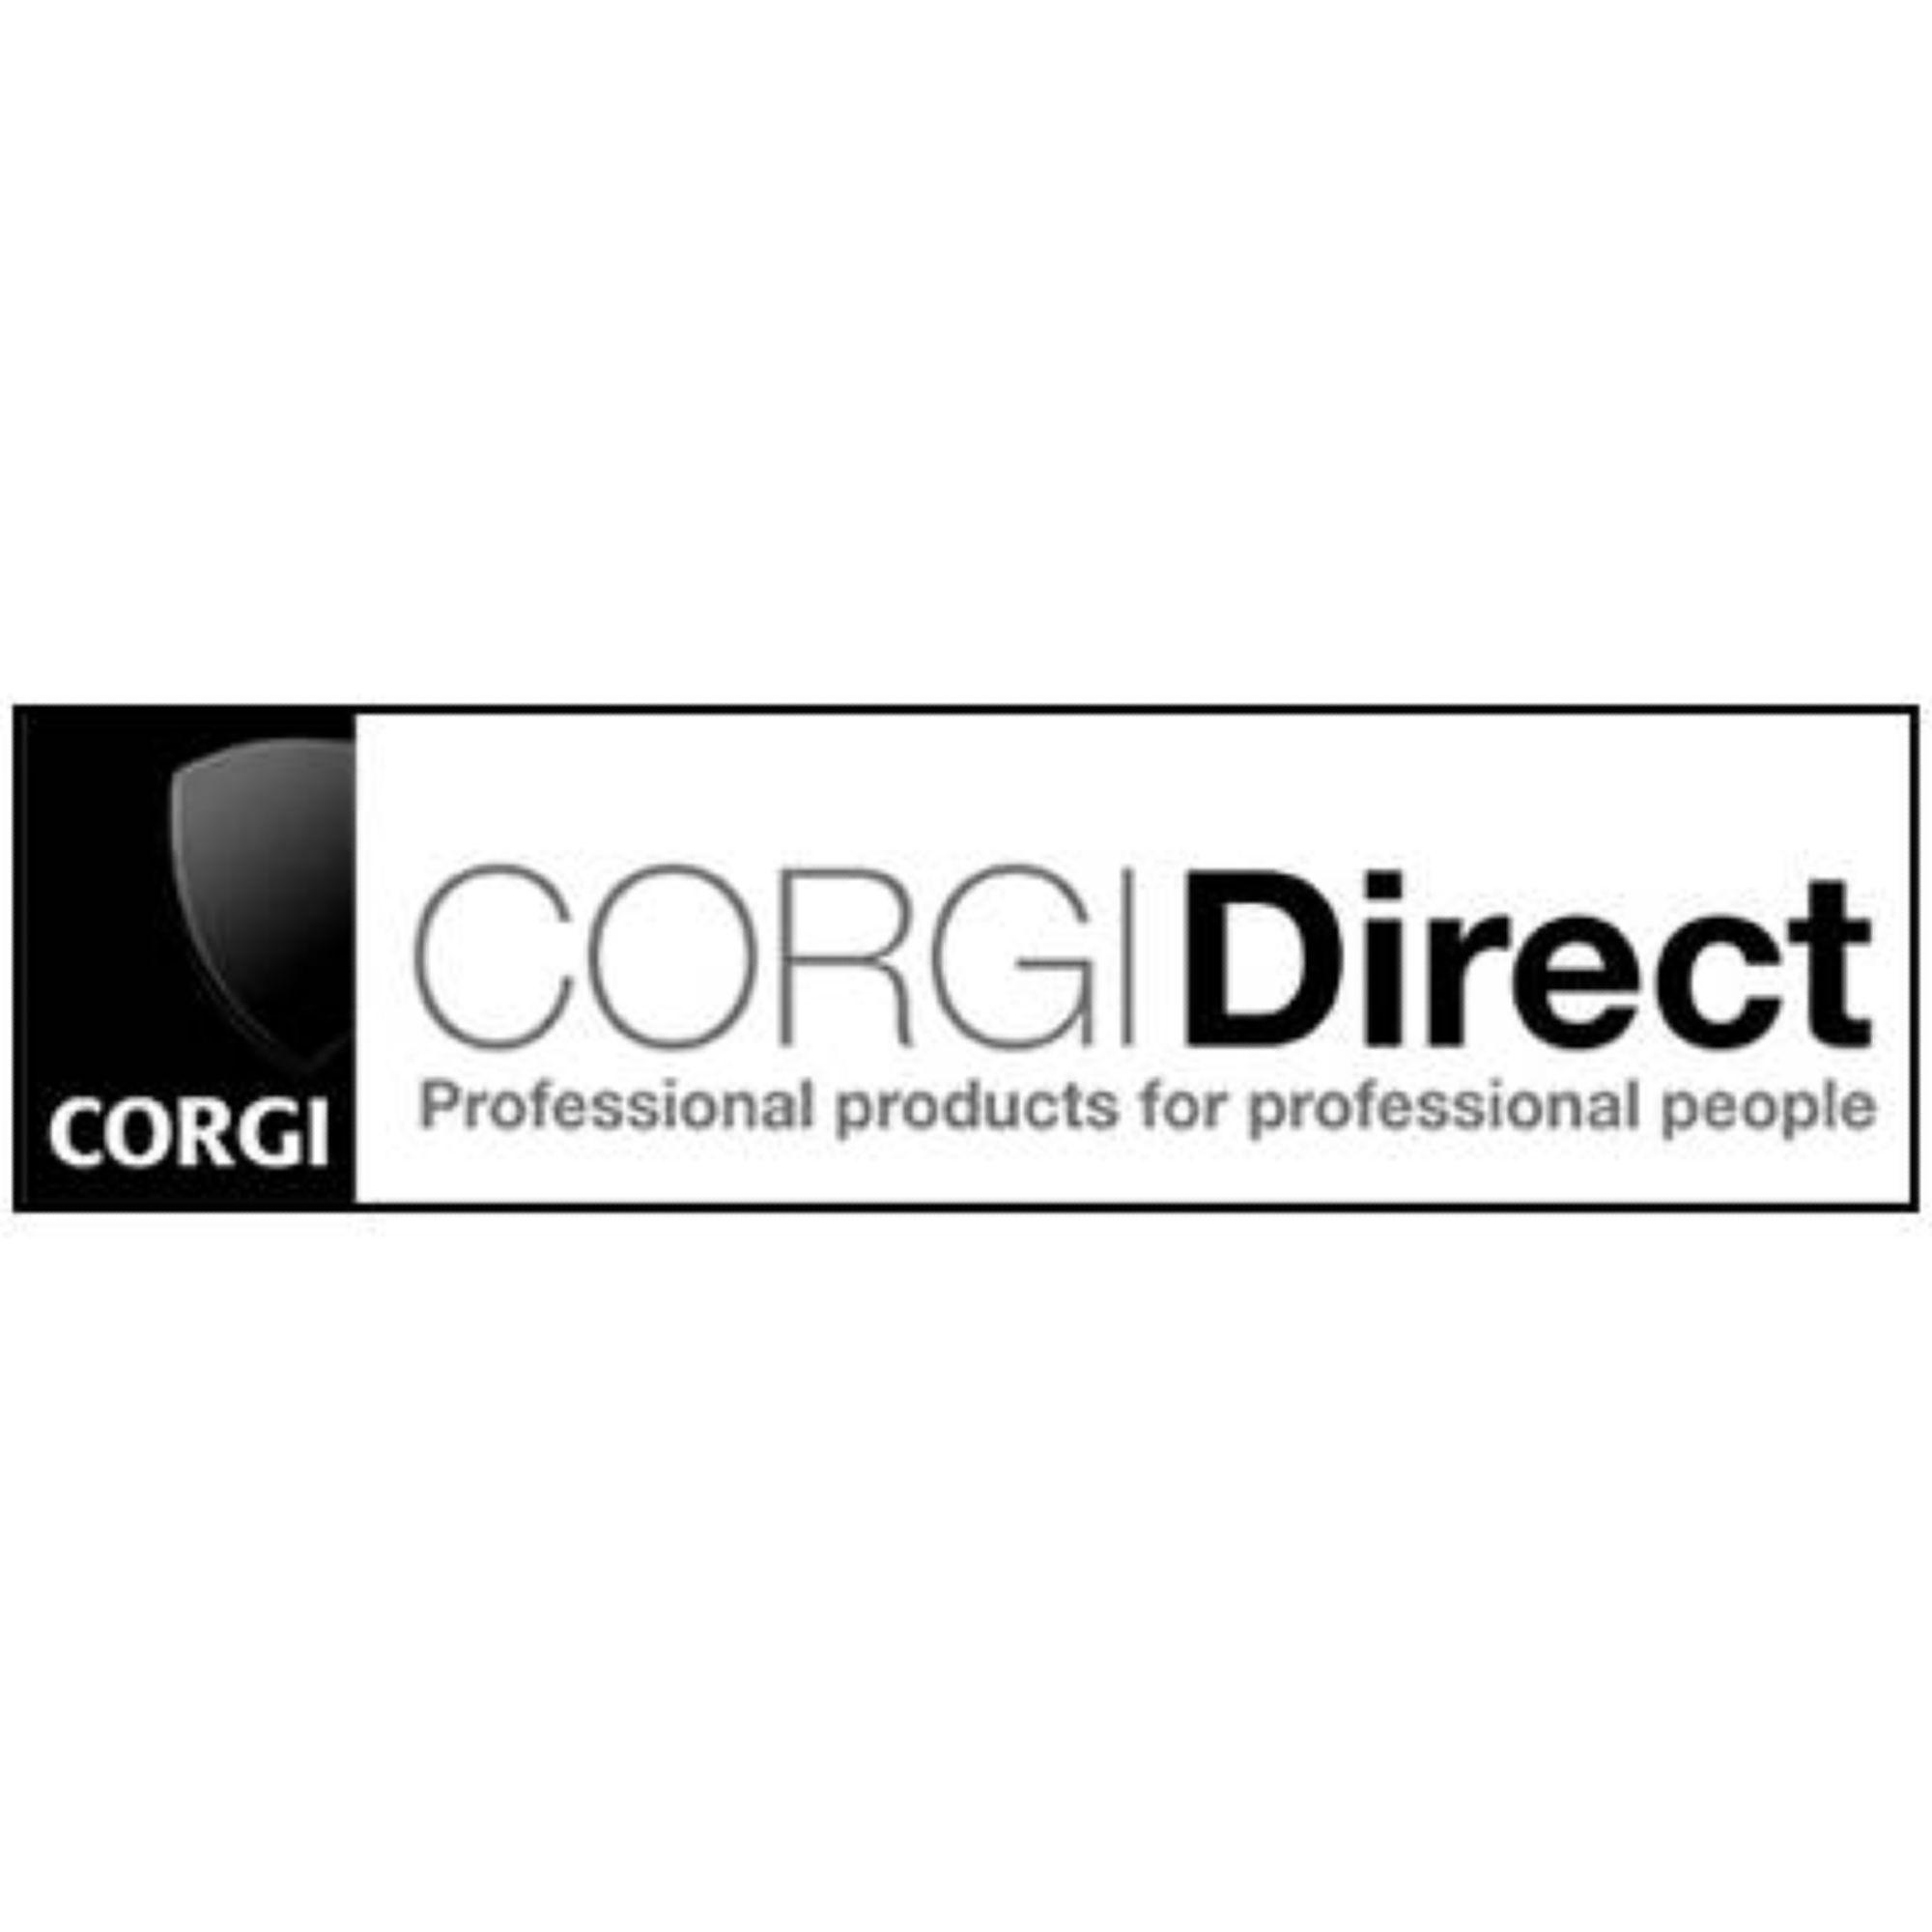 CORGI_mono_logo.jpg